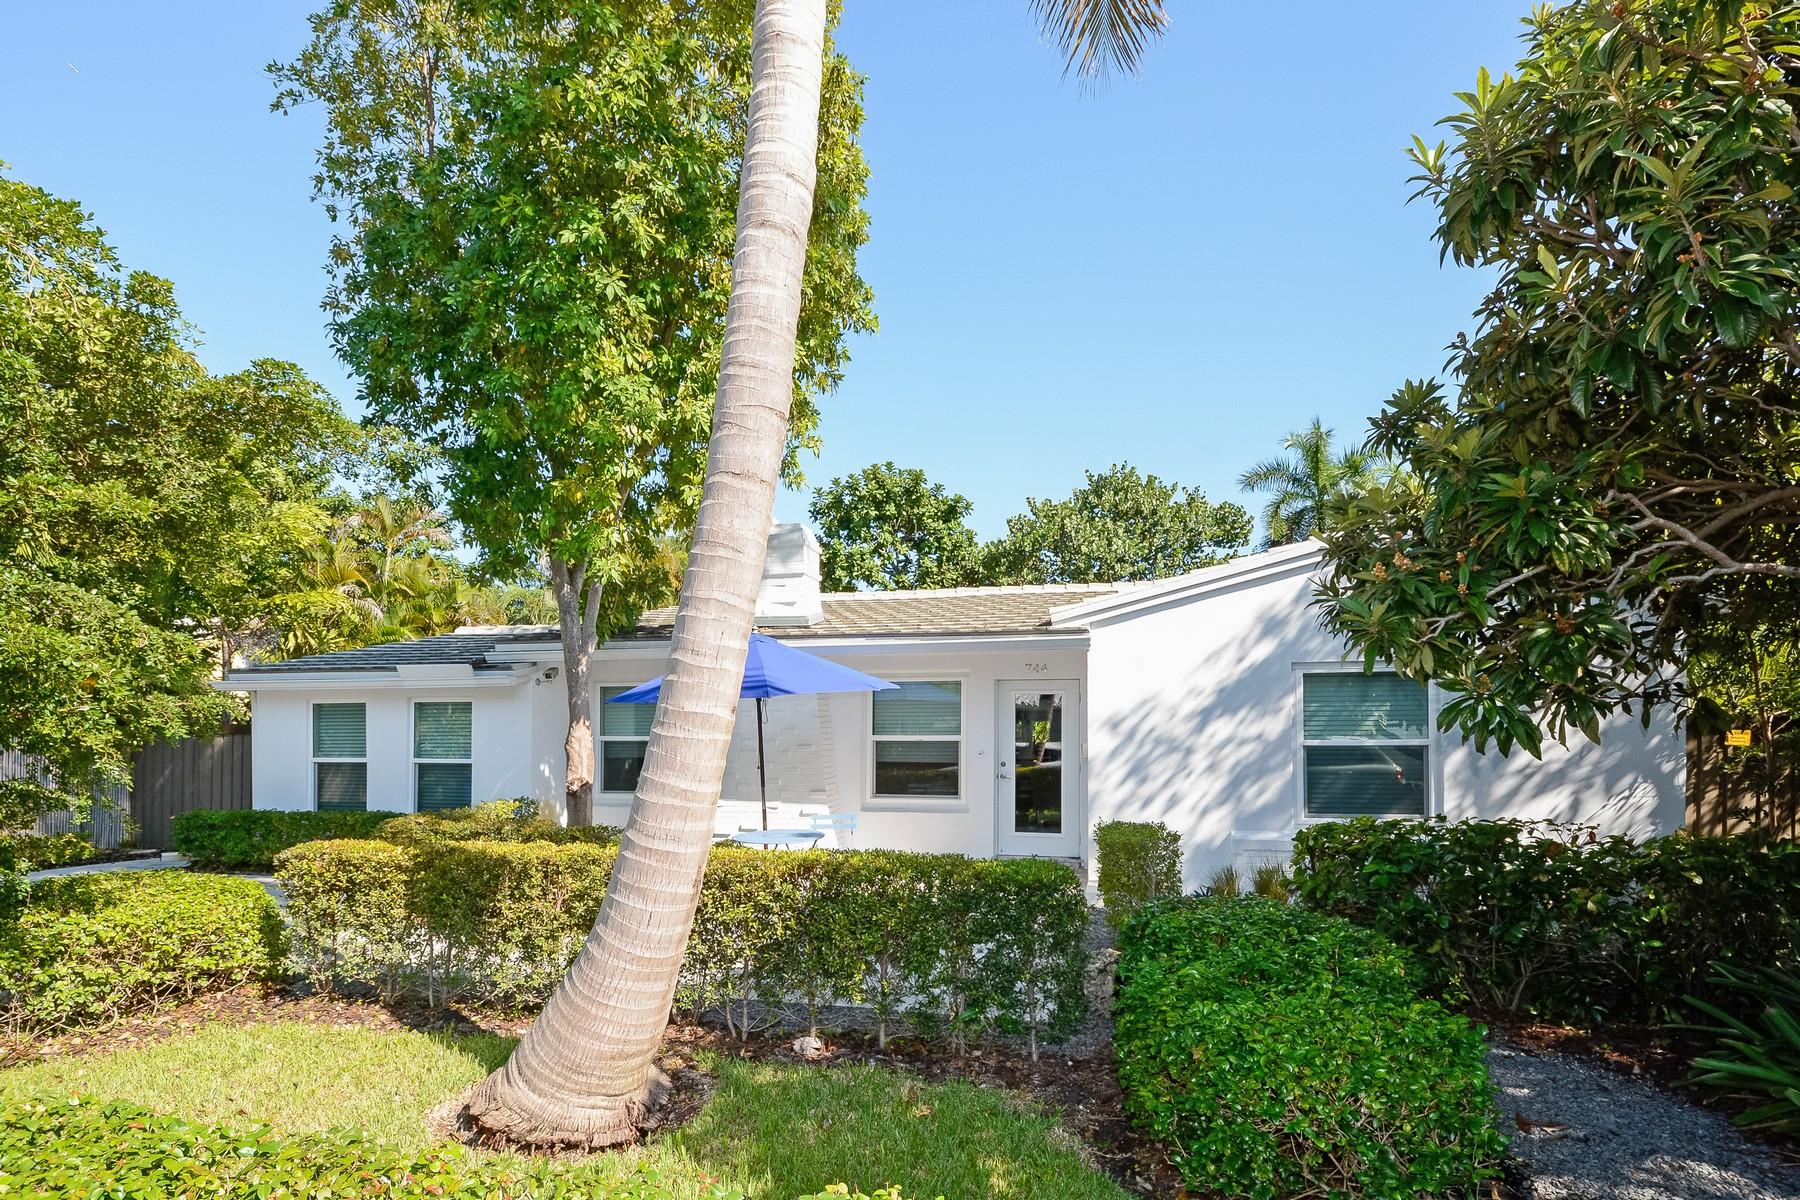 Moradia para Venda às Victoria Park 744 NE 16th Ave Fort Lauderdale, Florida 33304 Estados Unidos